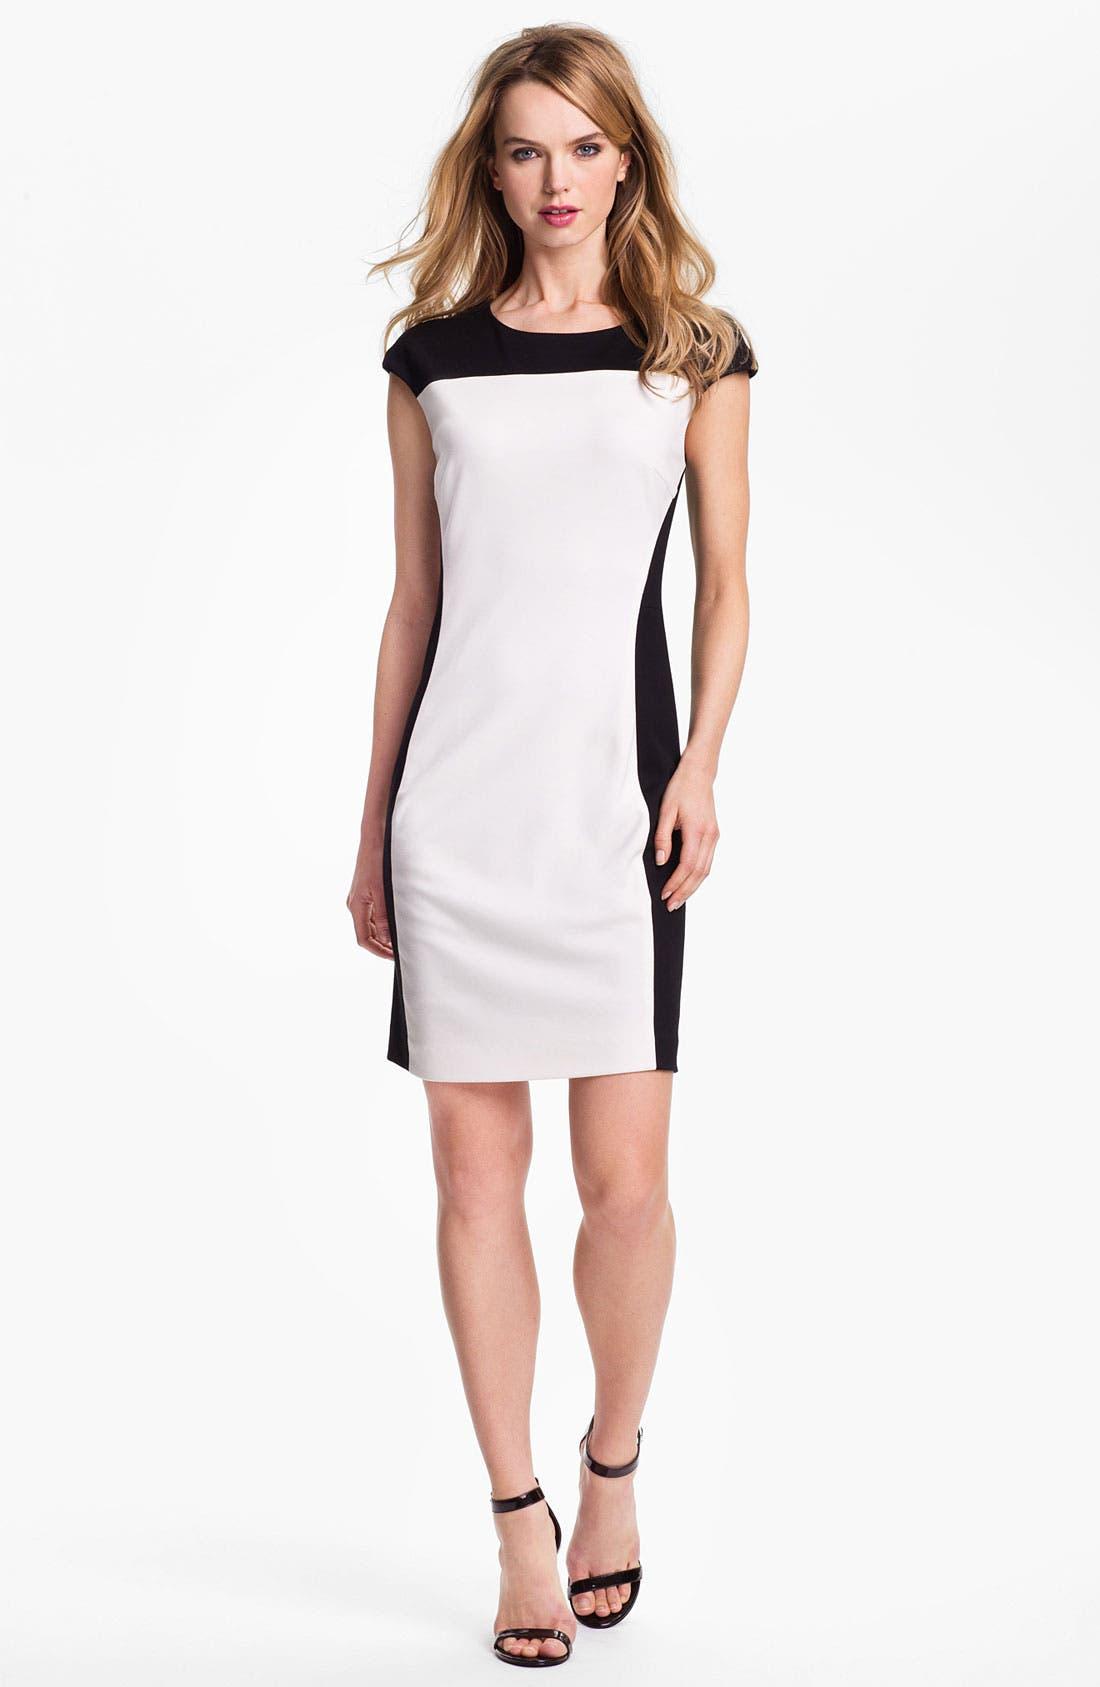 Alternate Image 1 Selected - Vince Camuto Colorblock Ponte Sheath Dress